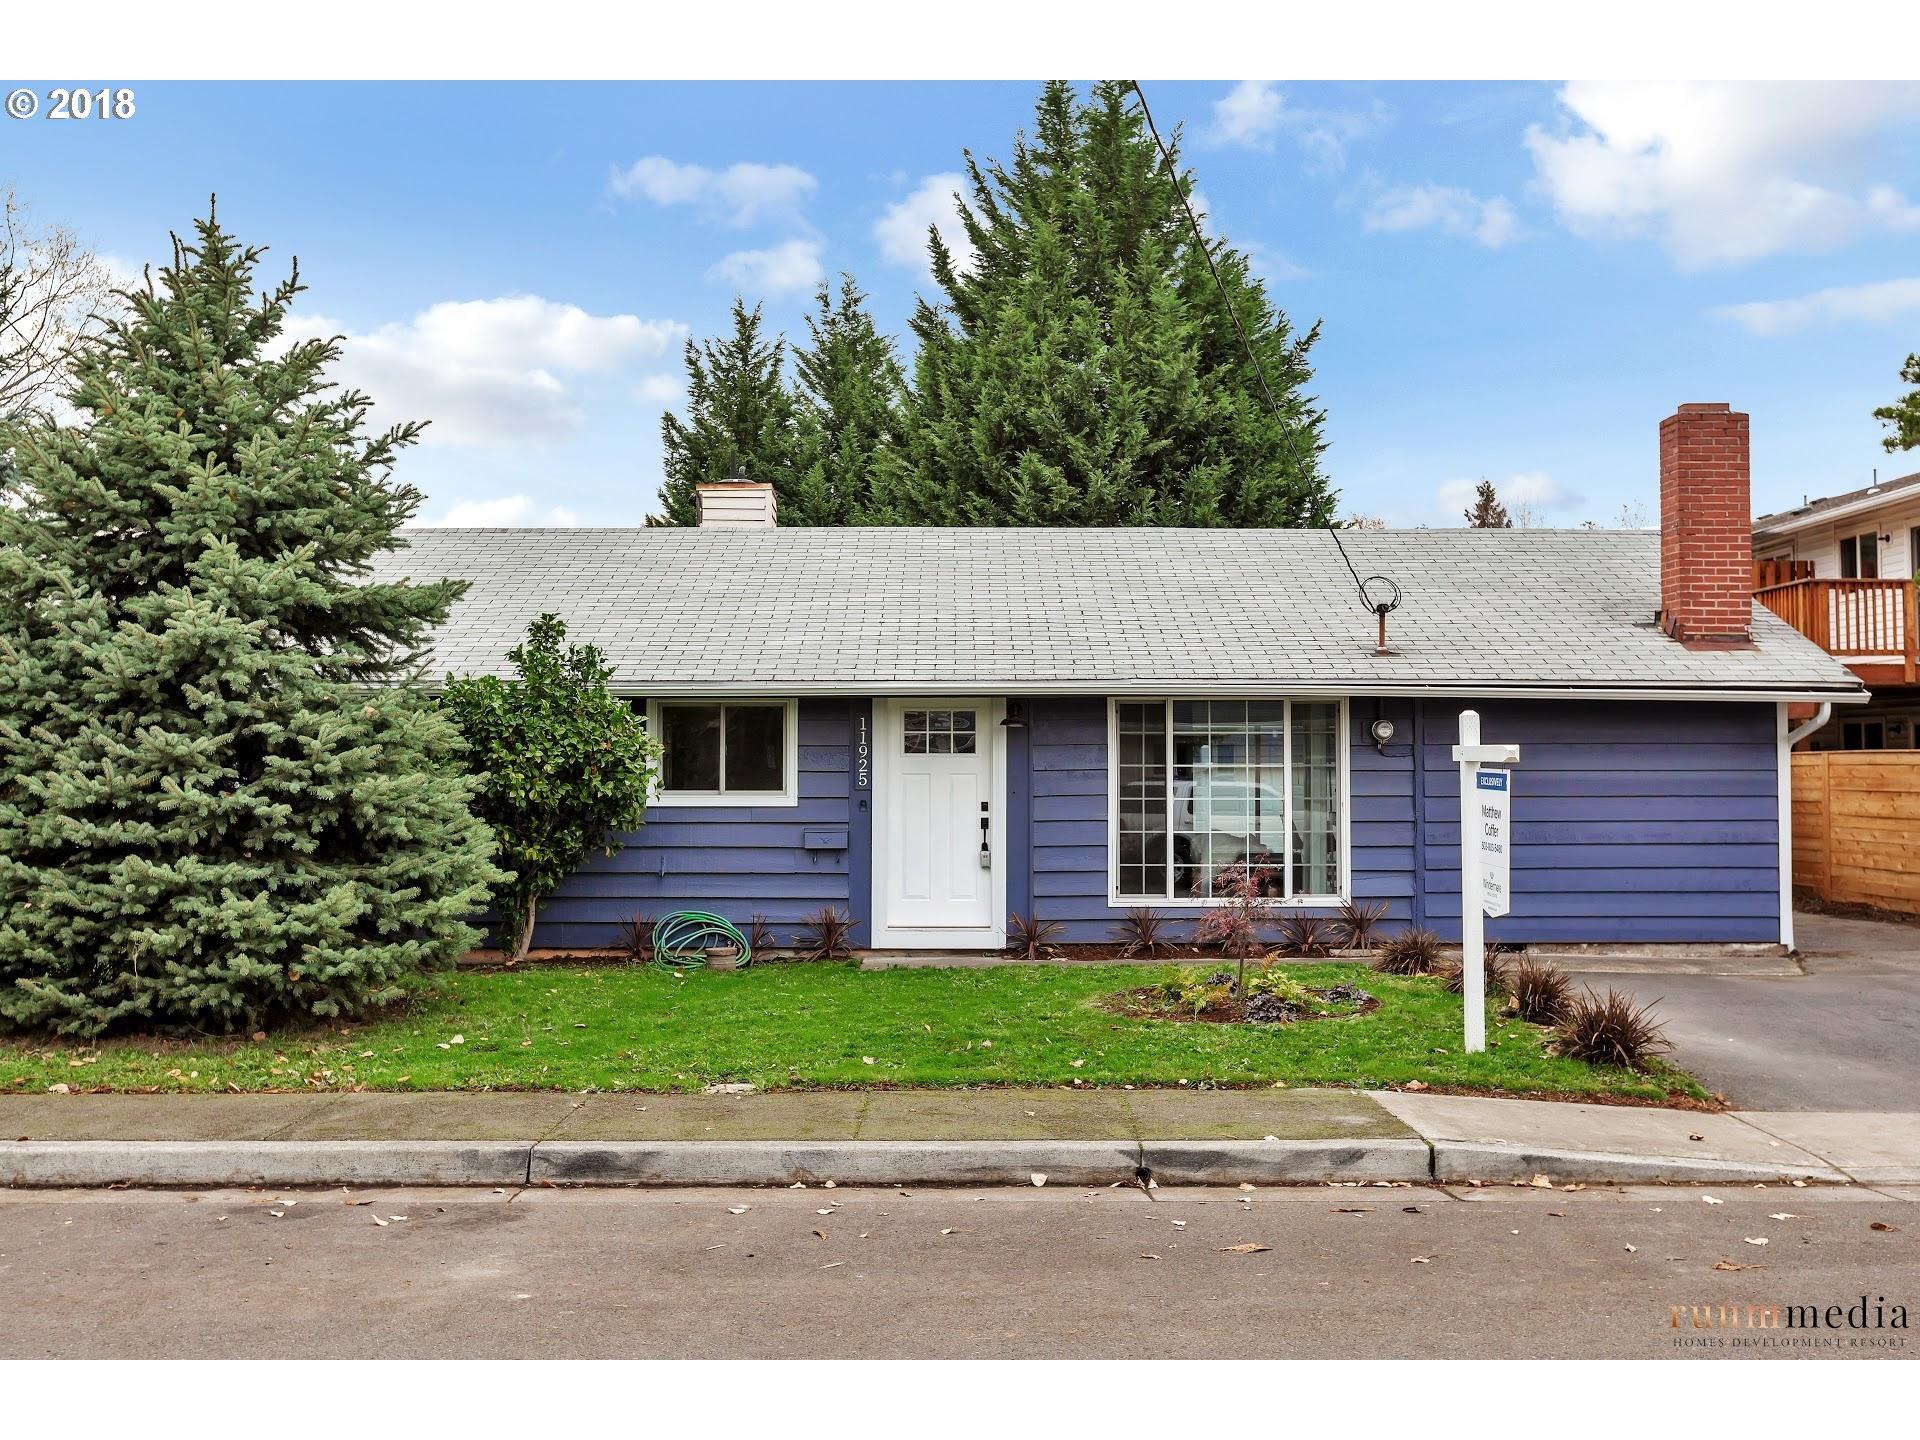 11925 SW 7TH ST Beaverton, OR 97005 - MLS #: 18173677